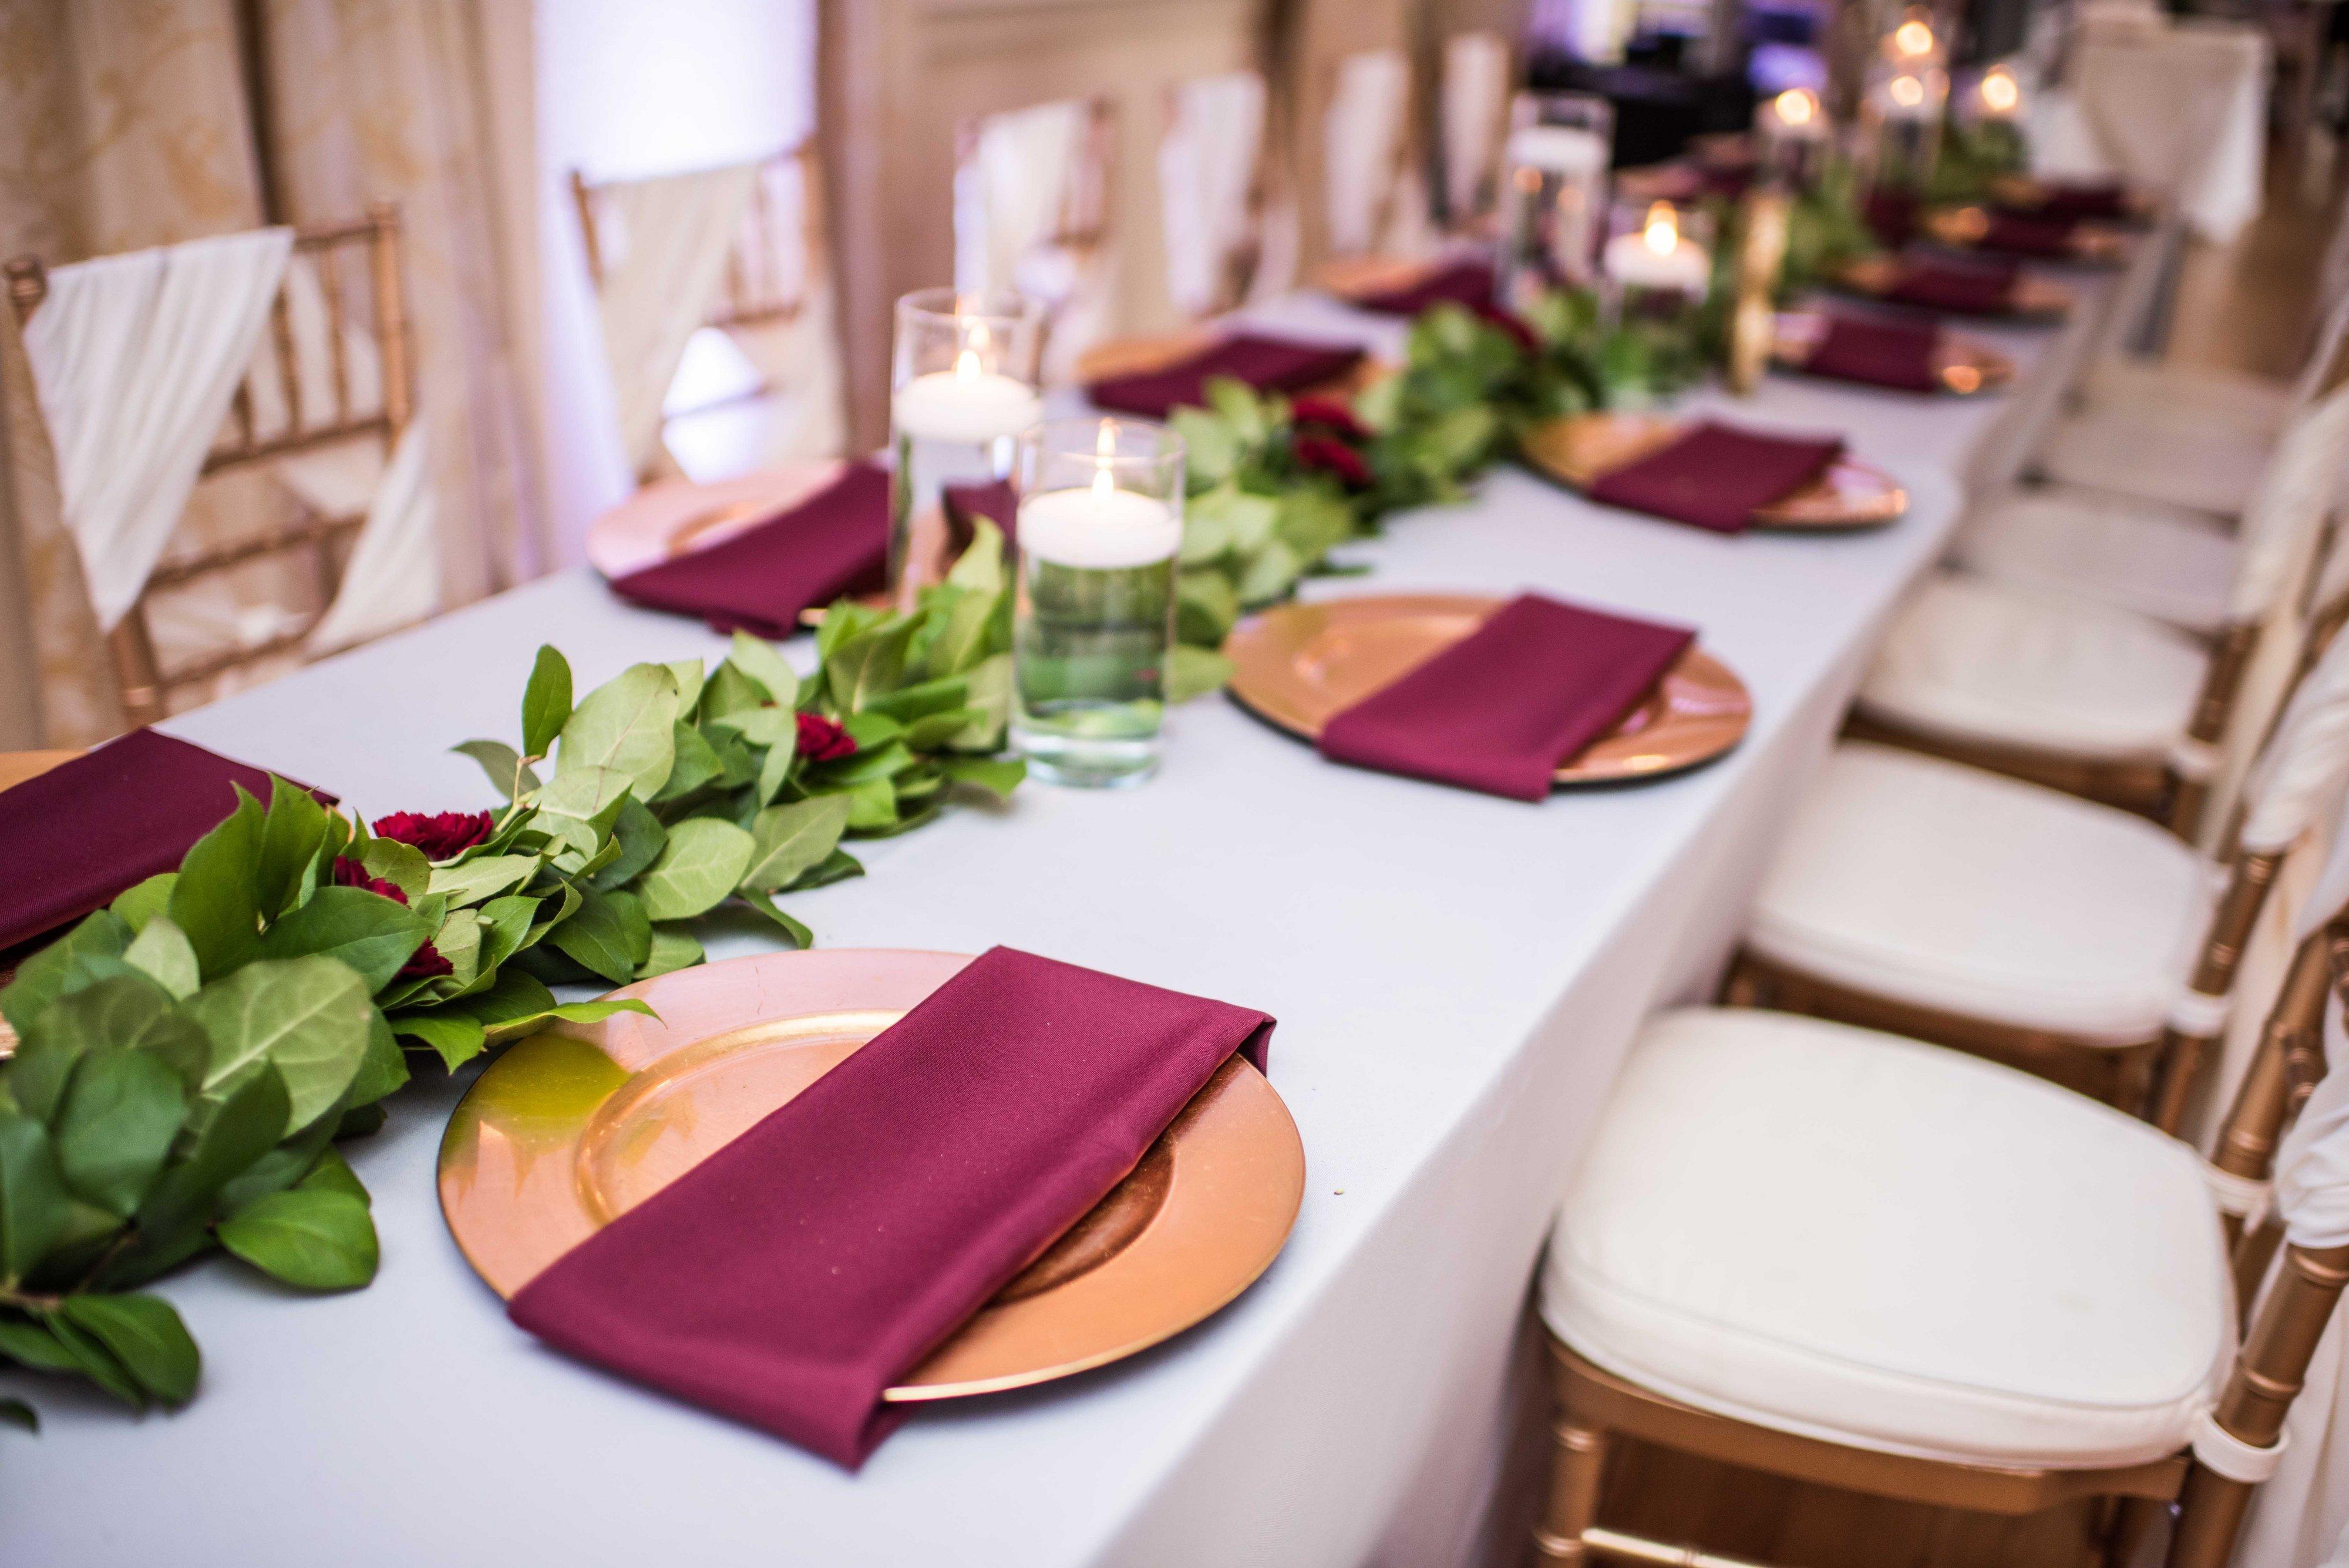 2018-Wedding-Trends-Lesner-Inn-Garland-Chair-Sash-Burgundy-Grey-Decor-2-Virginia-Beach.jpg